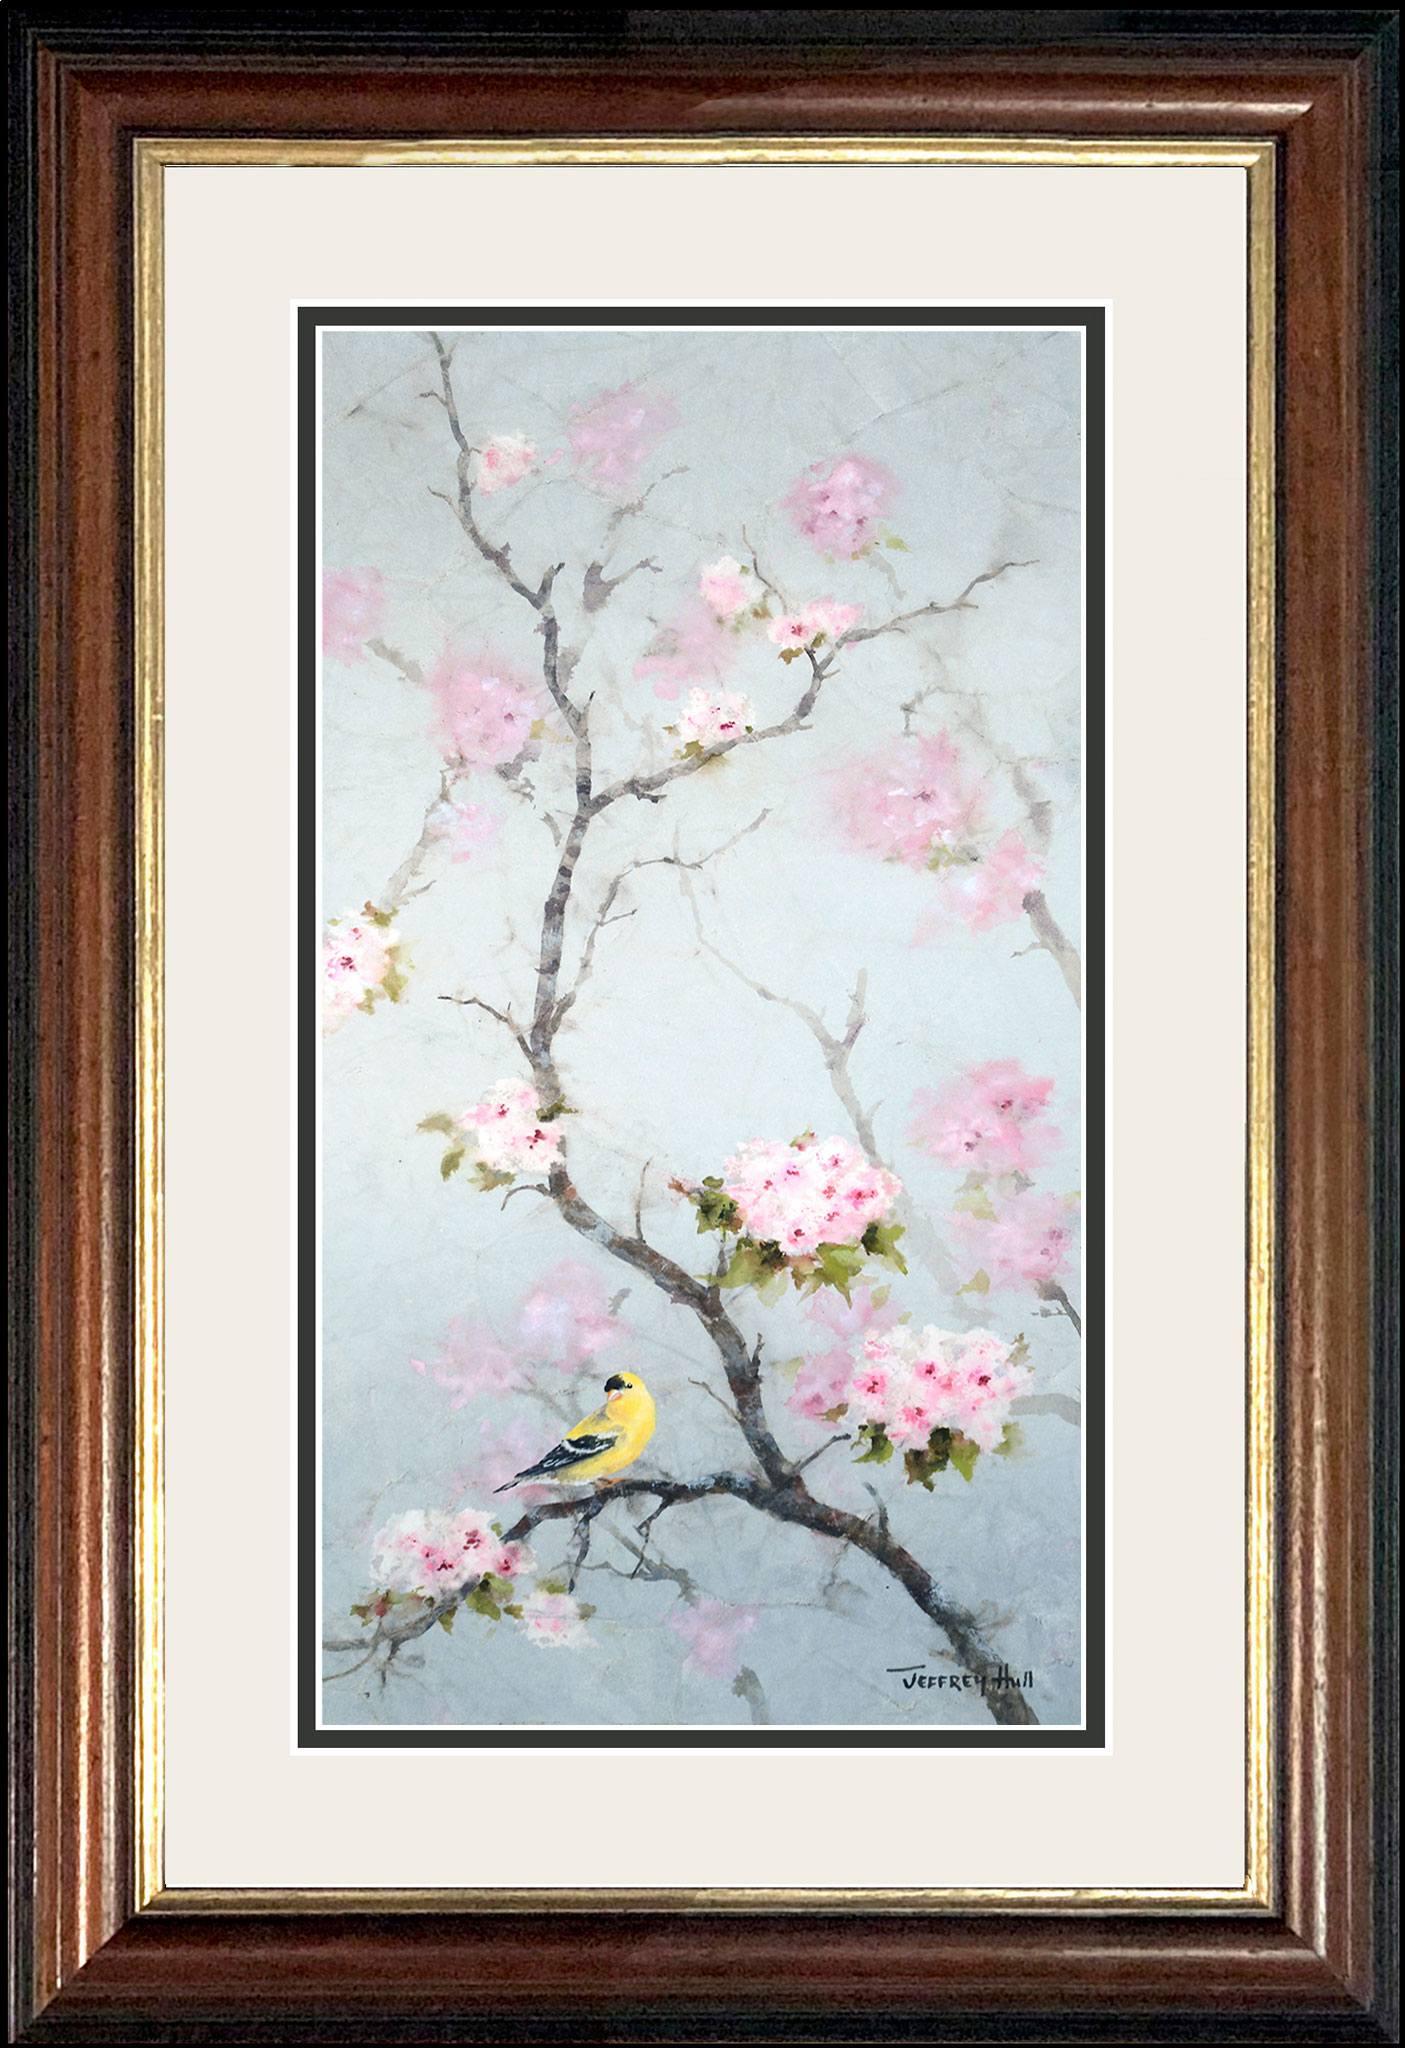 Goldfinch-_-Cherry-Blossoms-OpenEd-Malabar-Talc-Dark-Shale-4-Website-2021